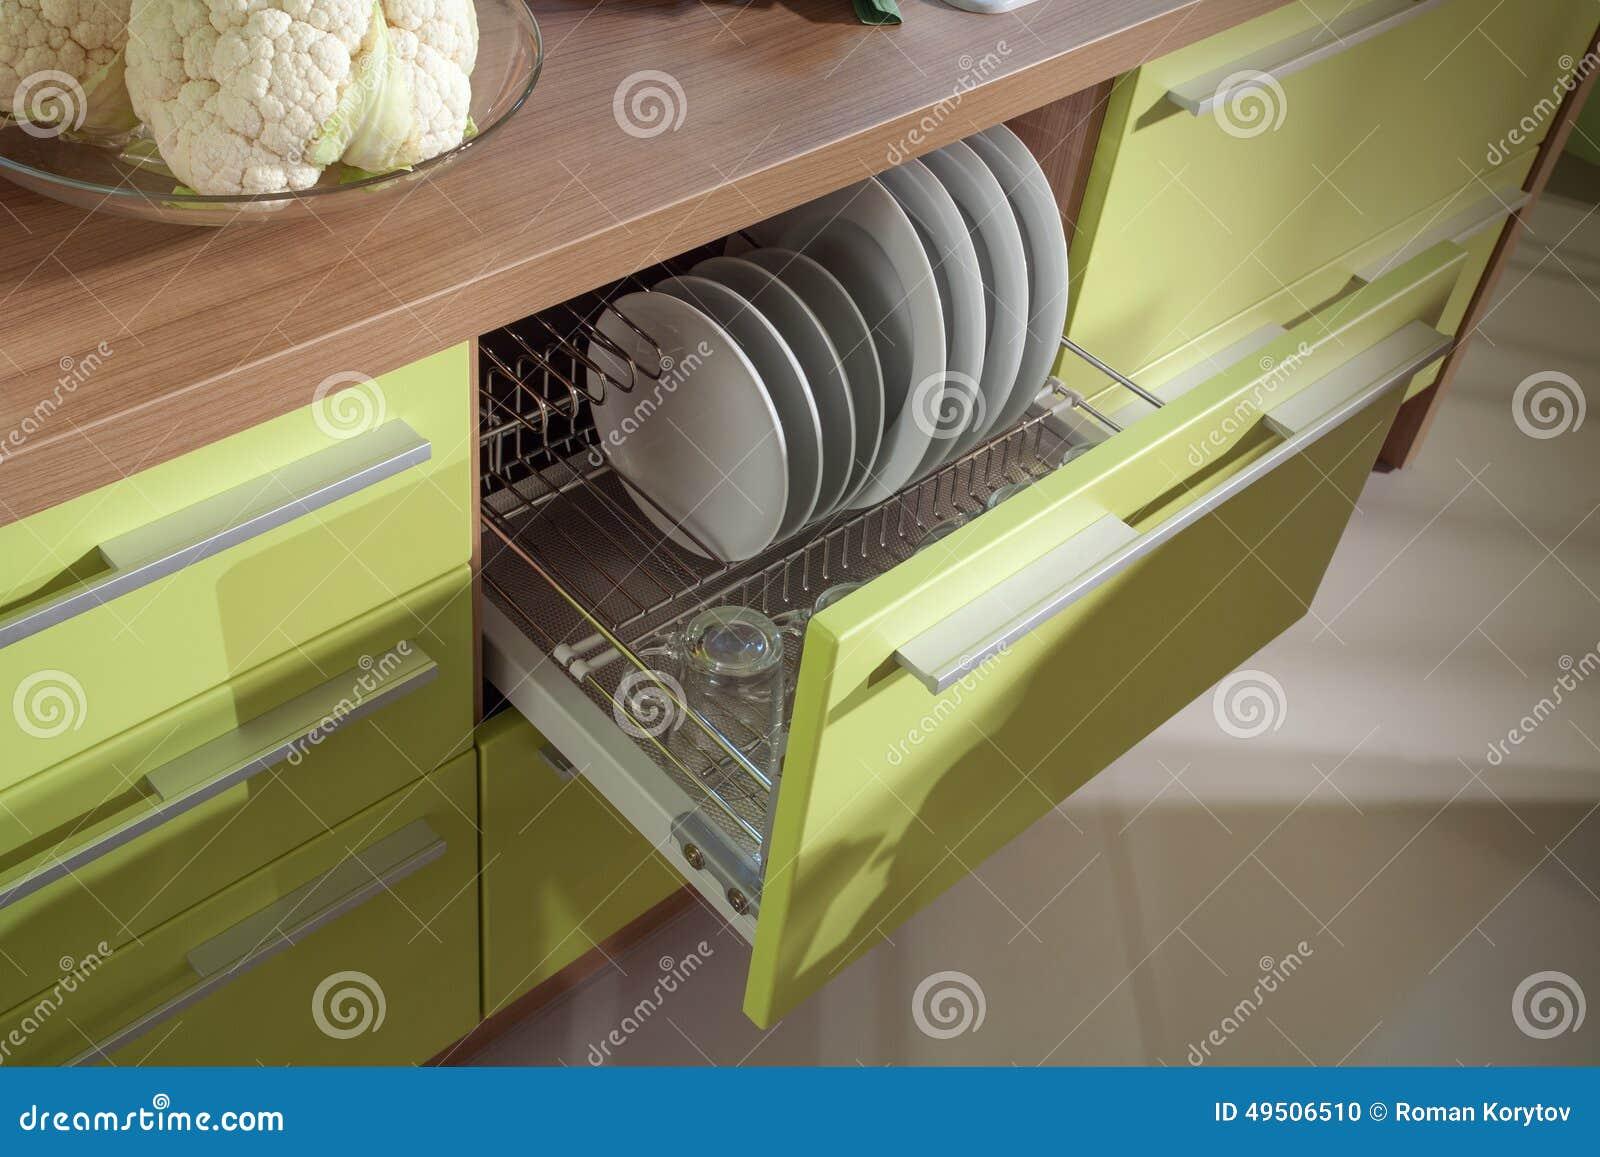 Simple Kitchen Furniture Macro Photo Stock Photo - Image of drawer